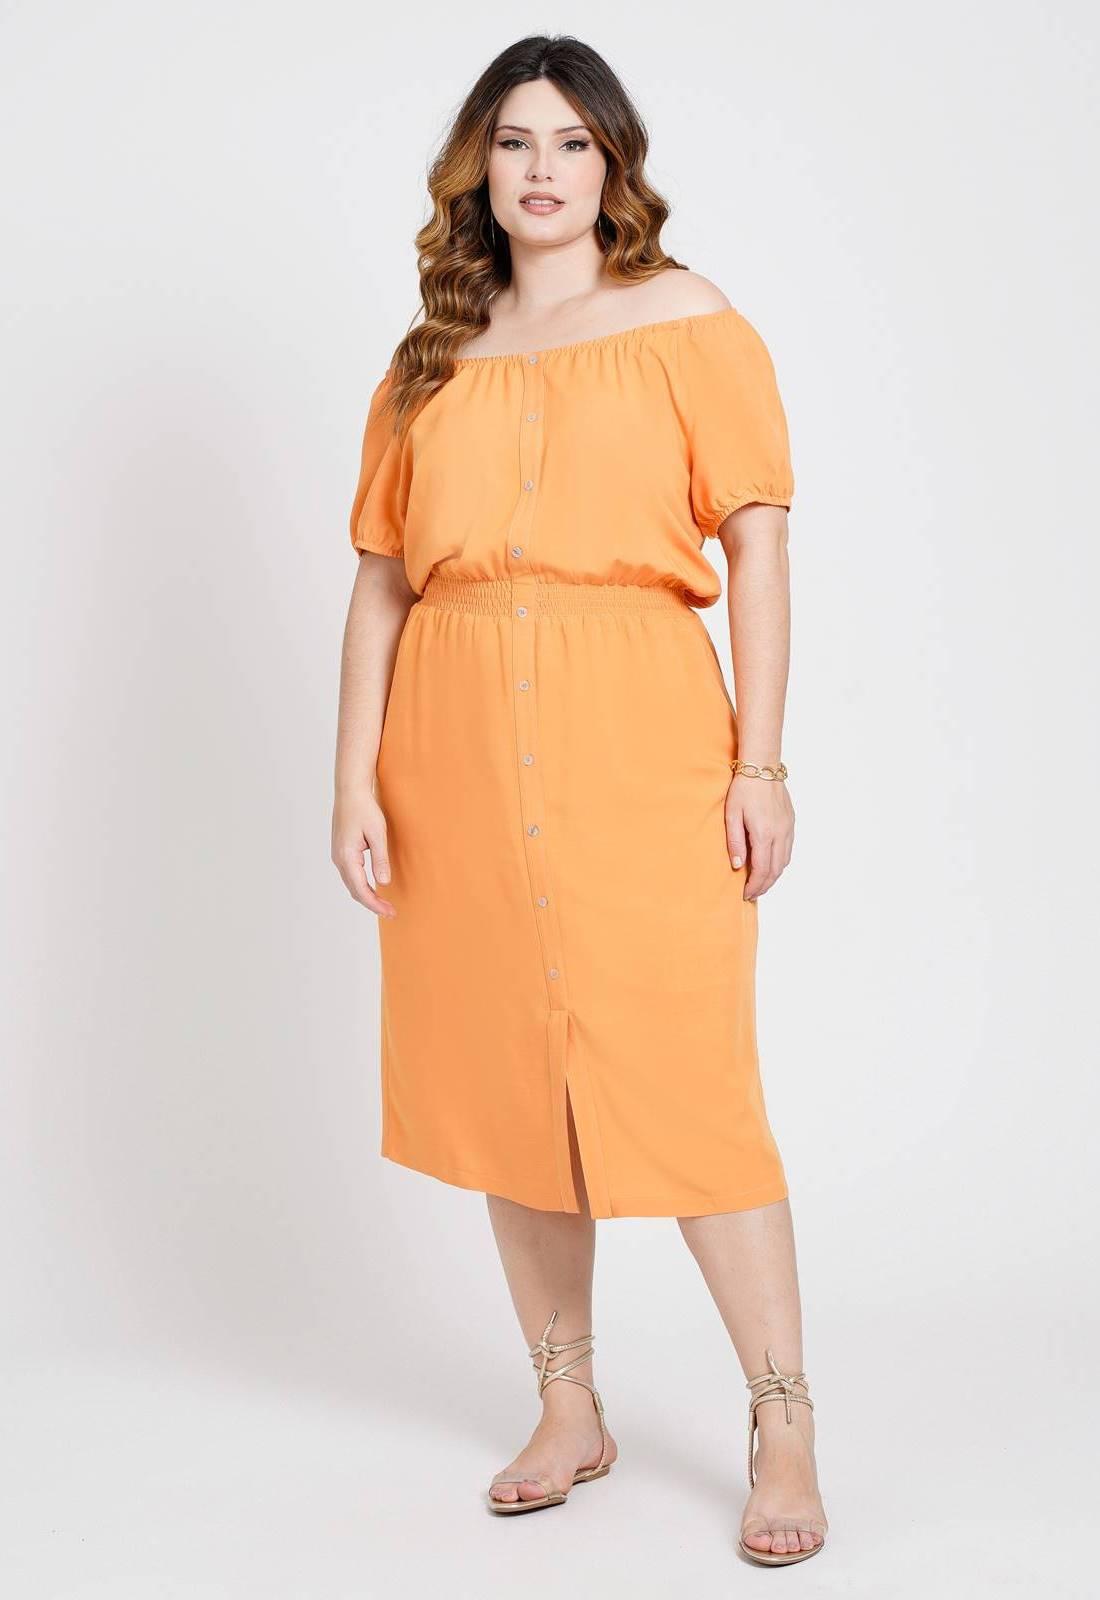 Vestido  midi com elastex Laranja  Ref. U79021